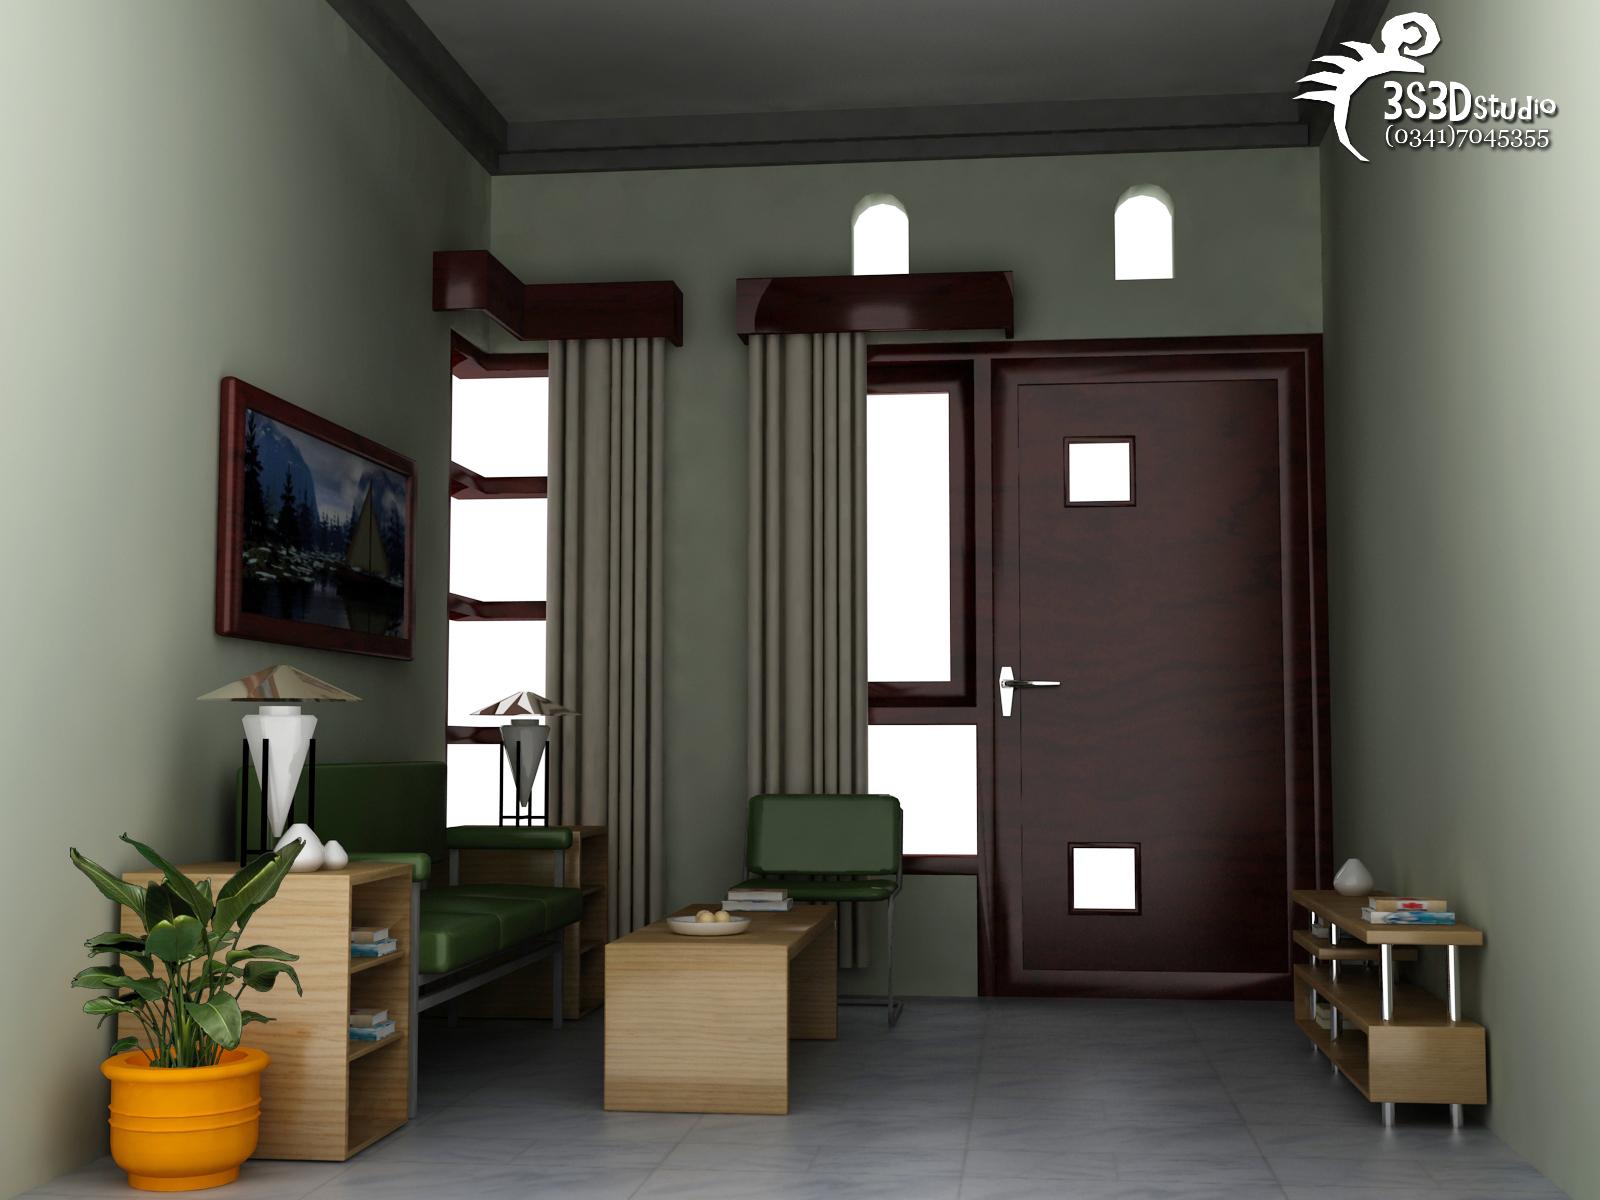 Foto interior rumah mungil 77